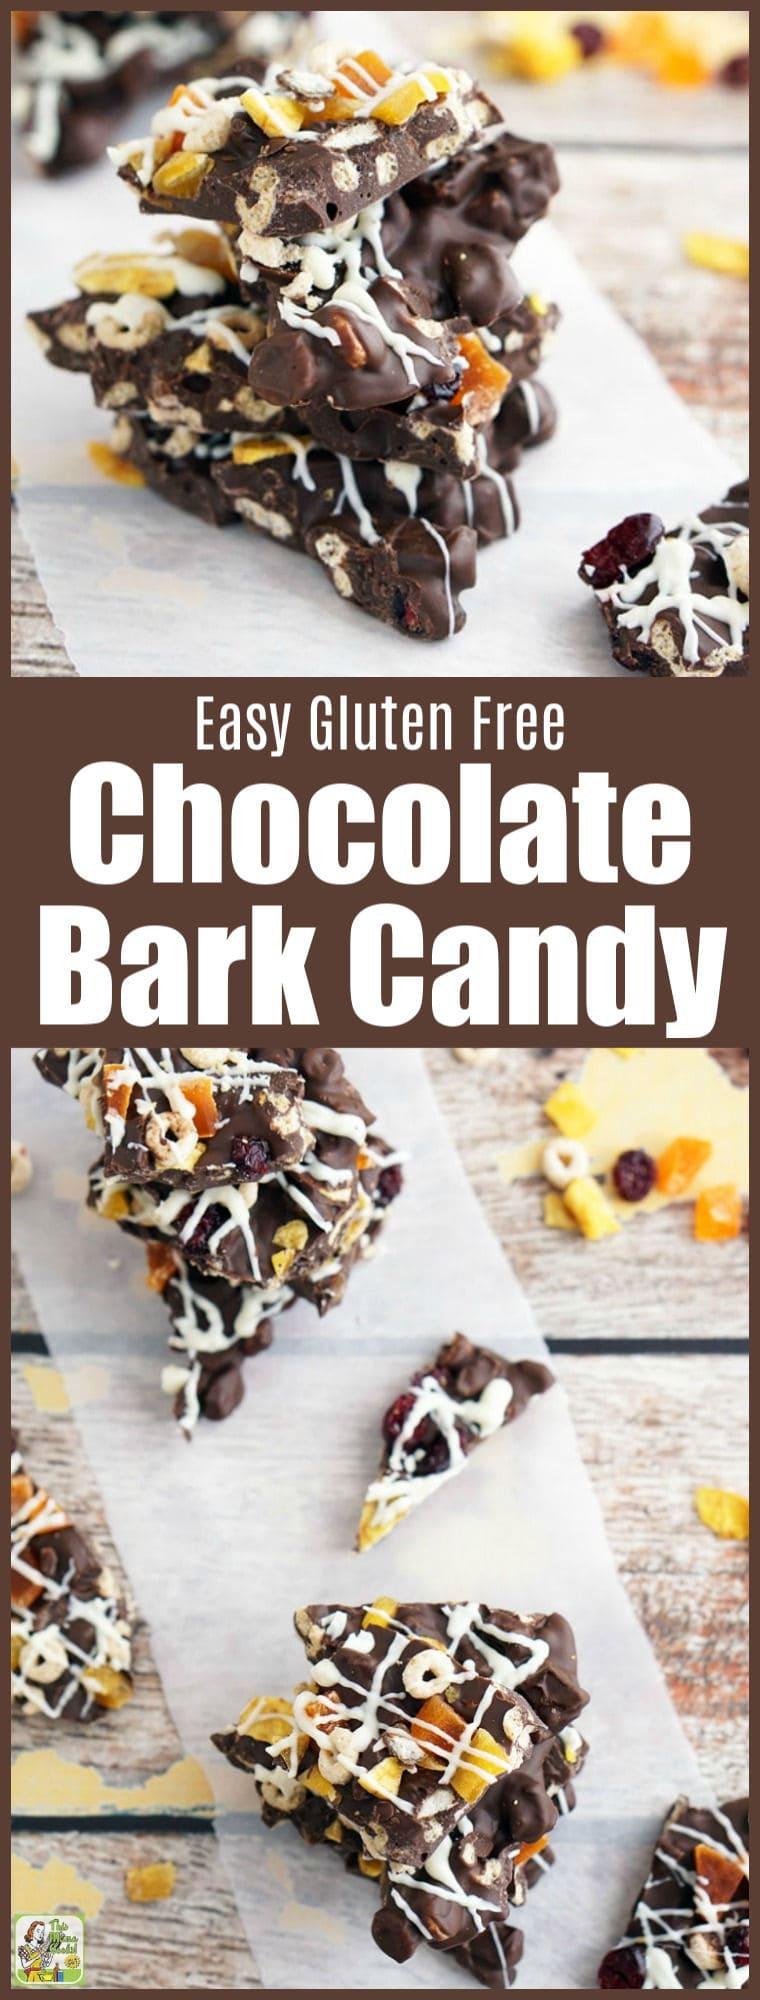 Easy Gluten Free Chocolate Bark Candy Recipe